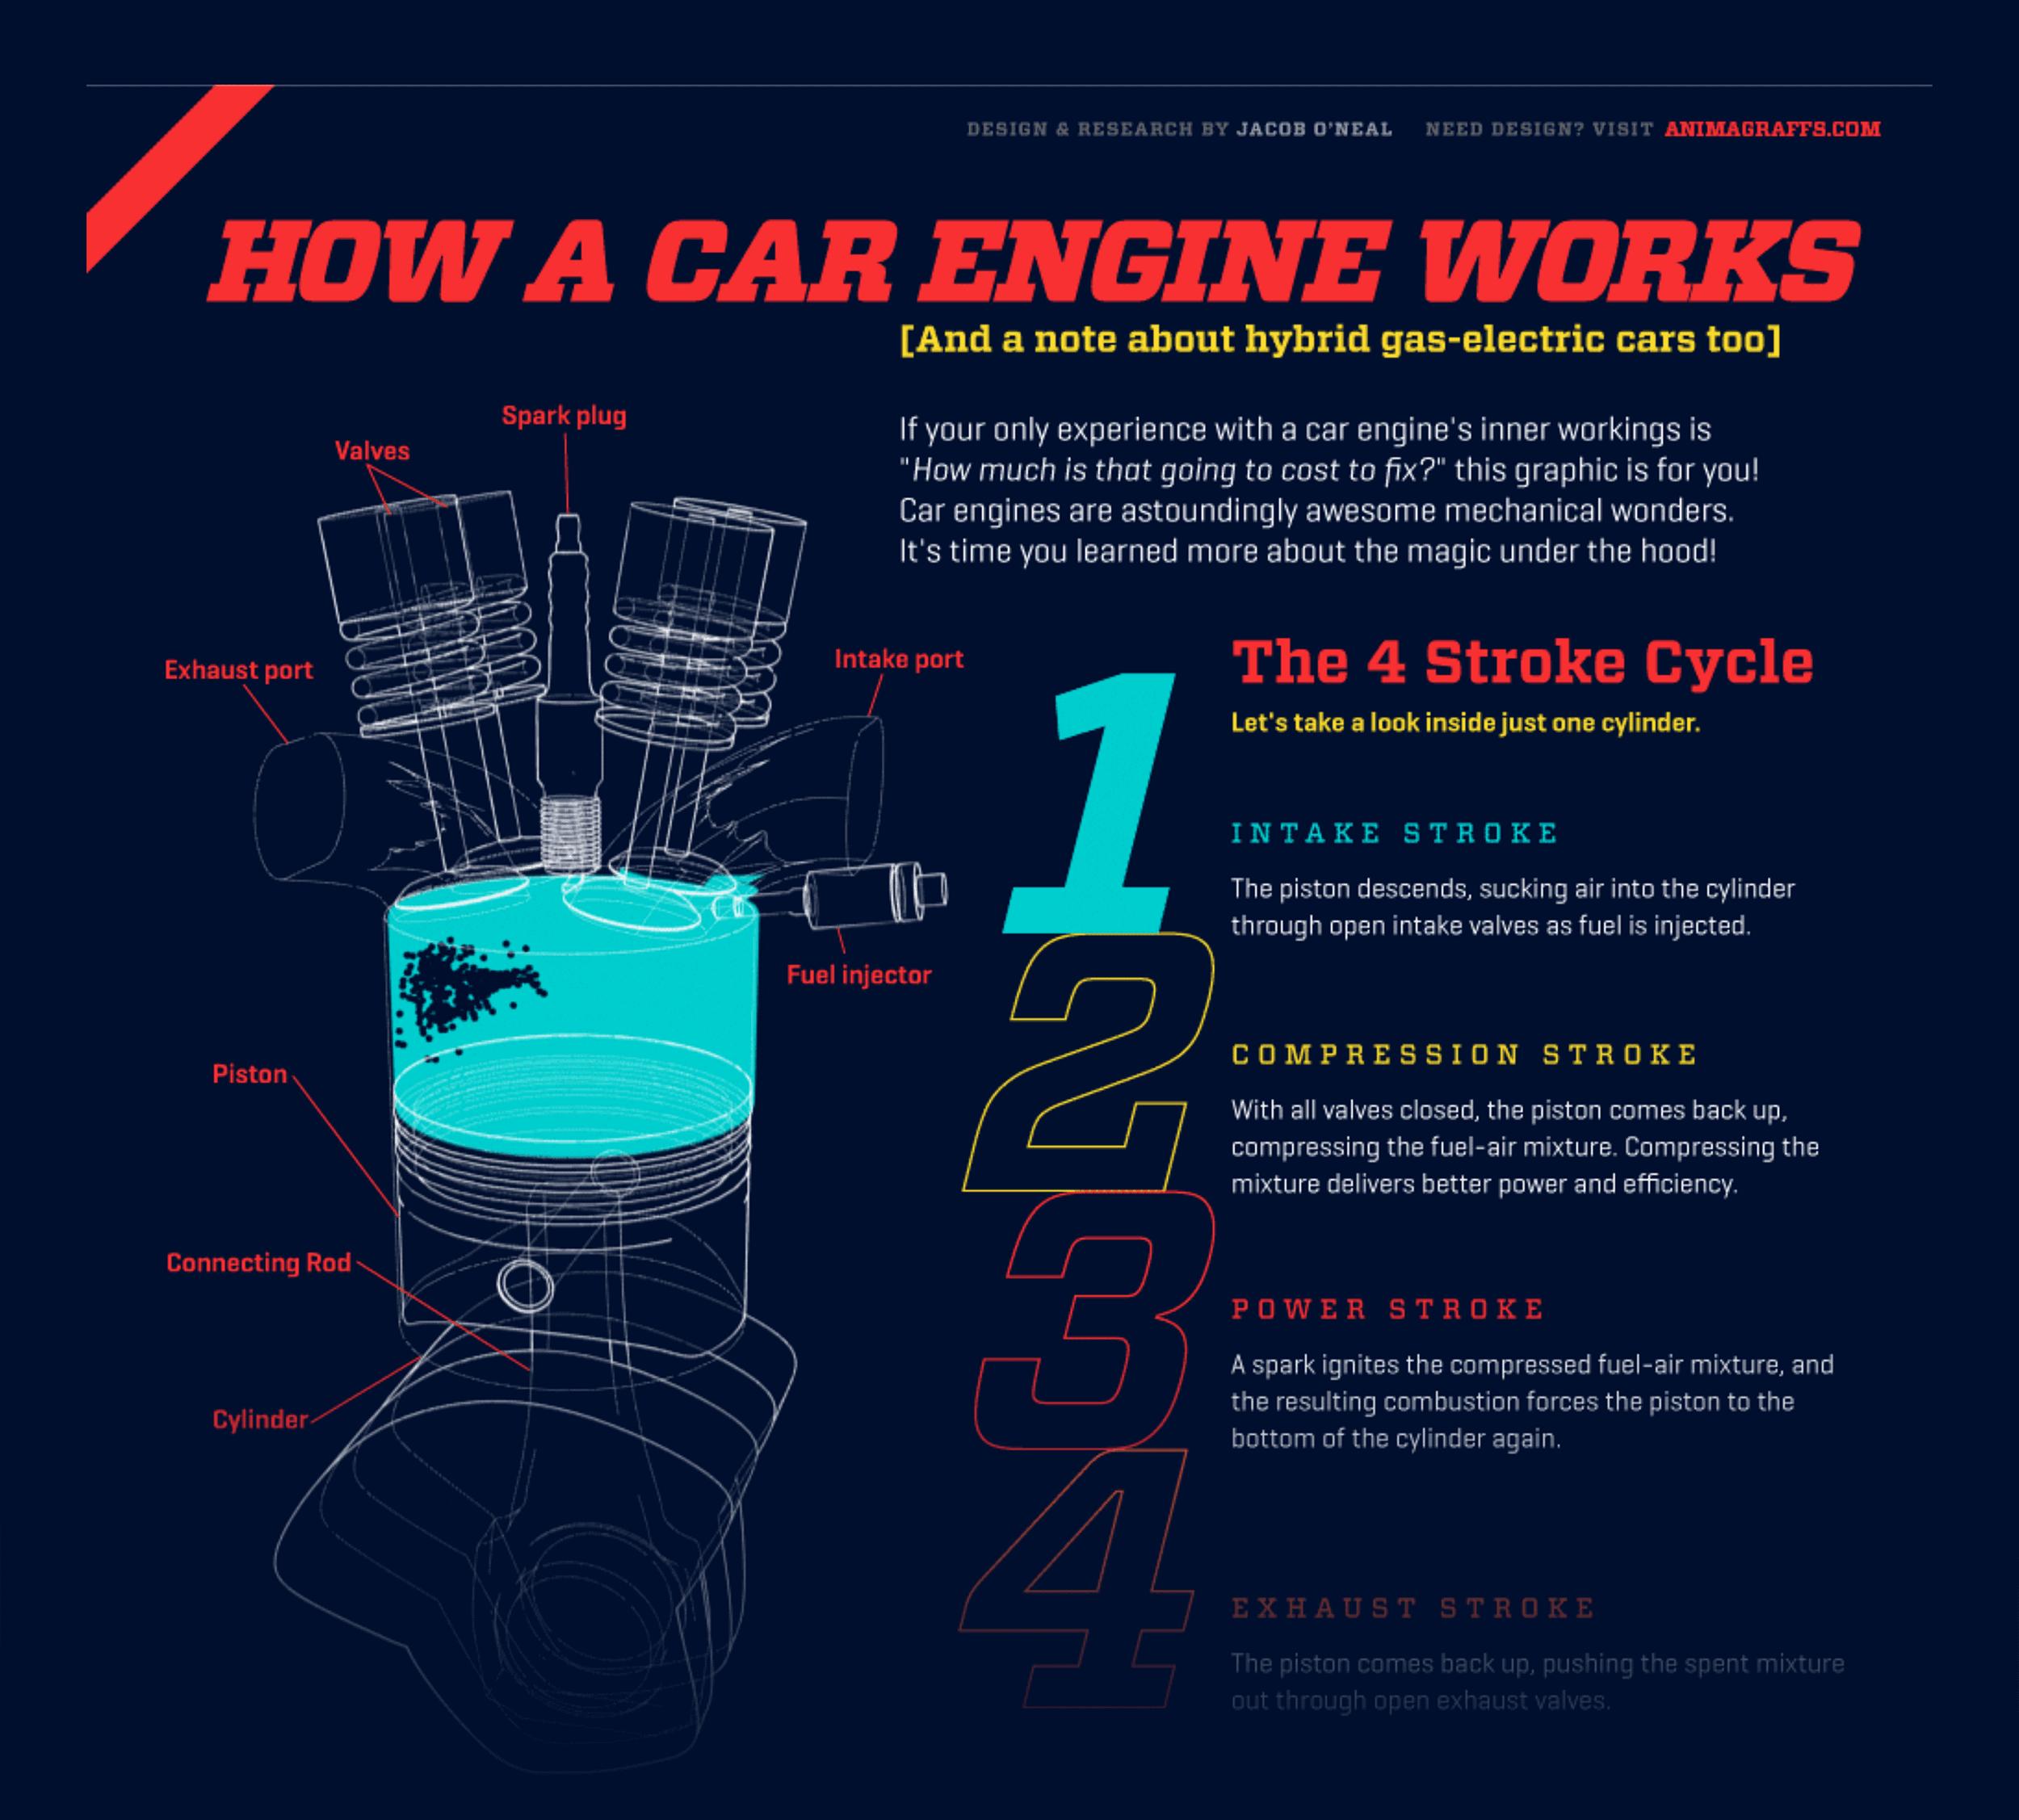 How a car engine works GIF